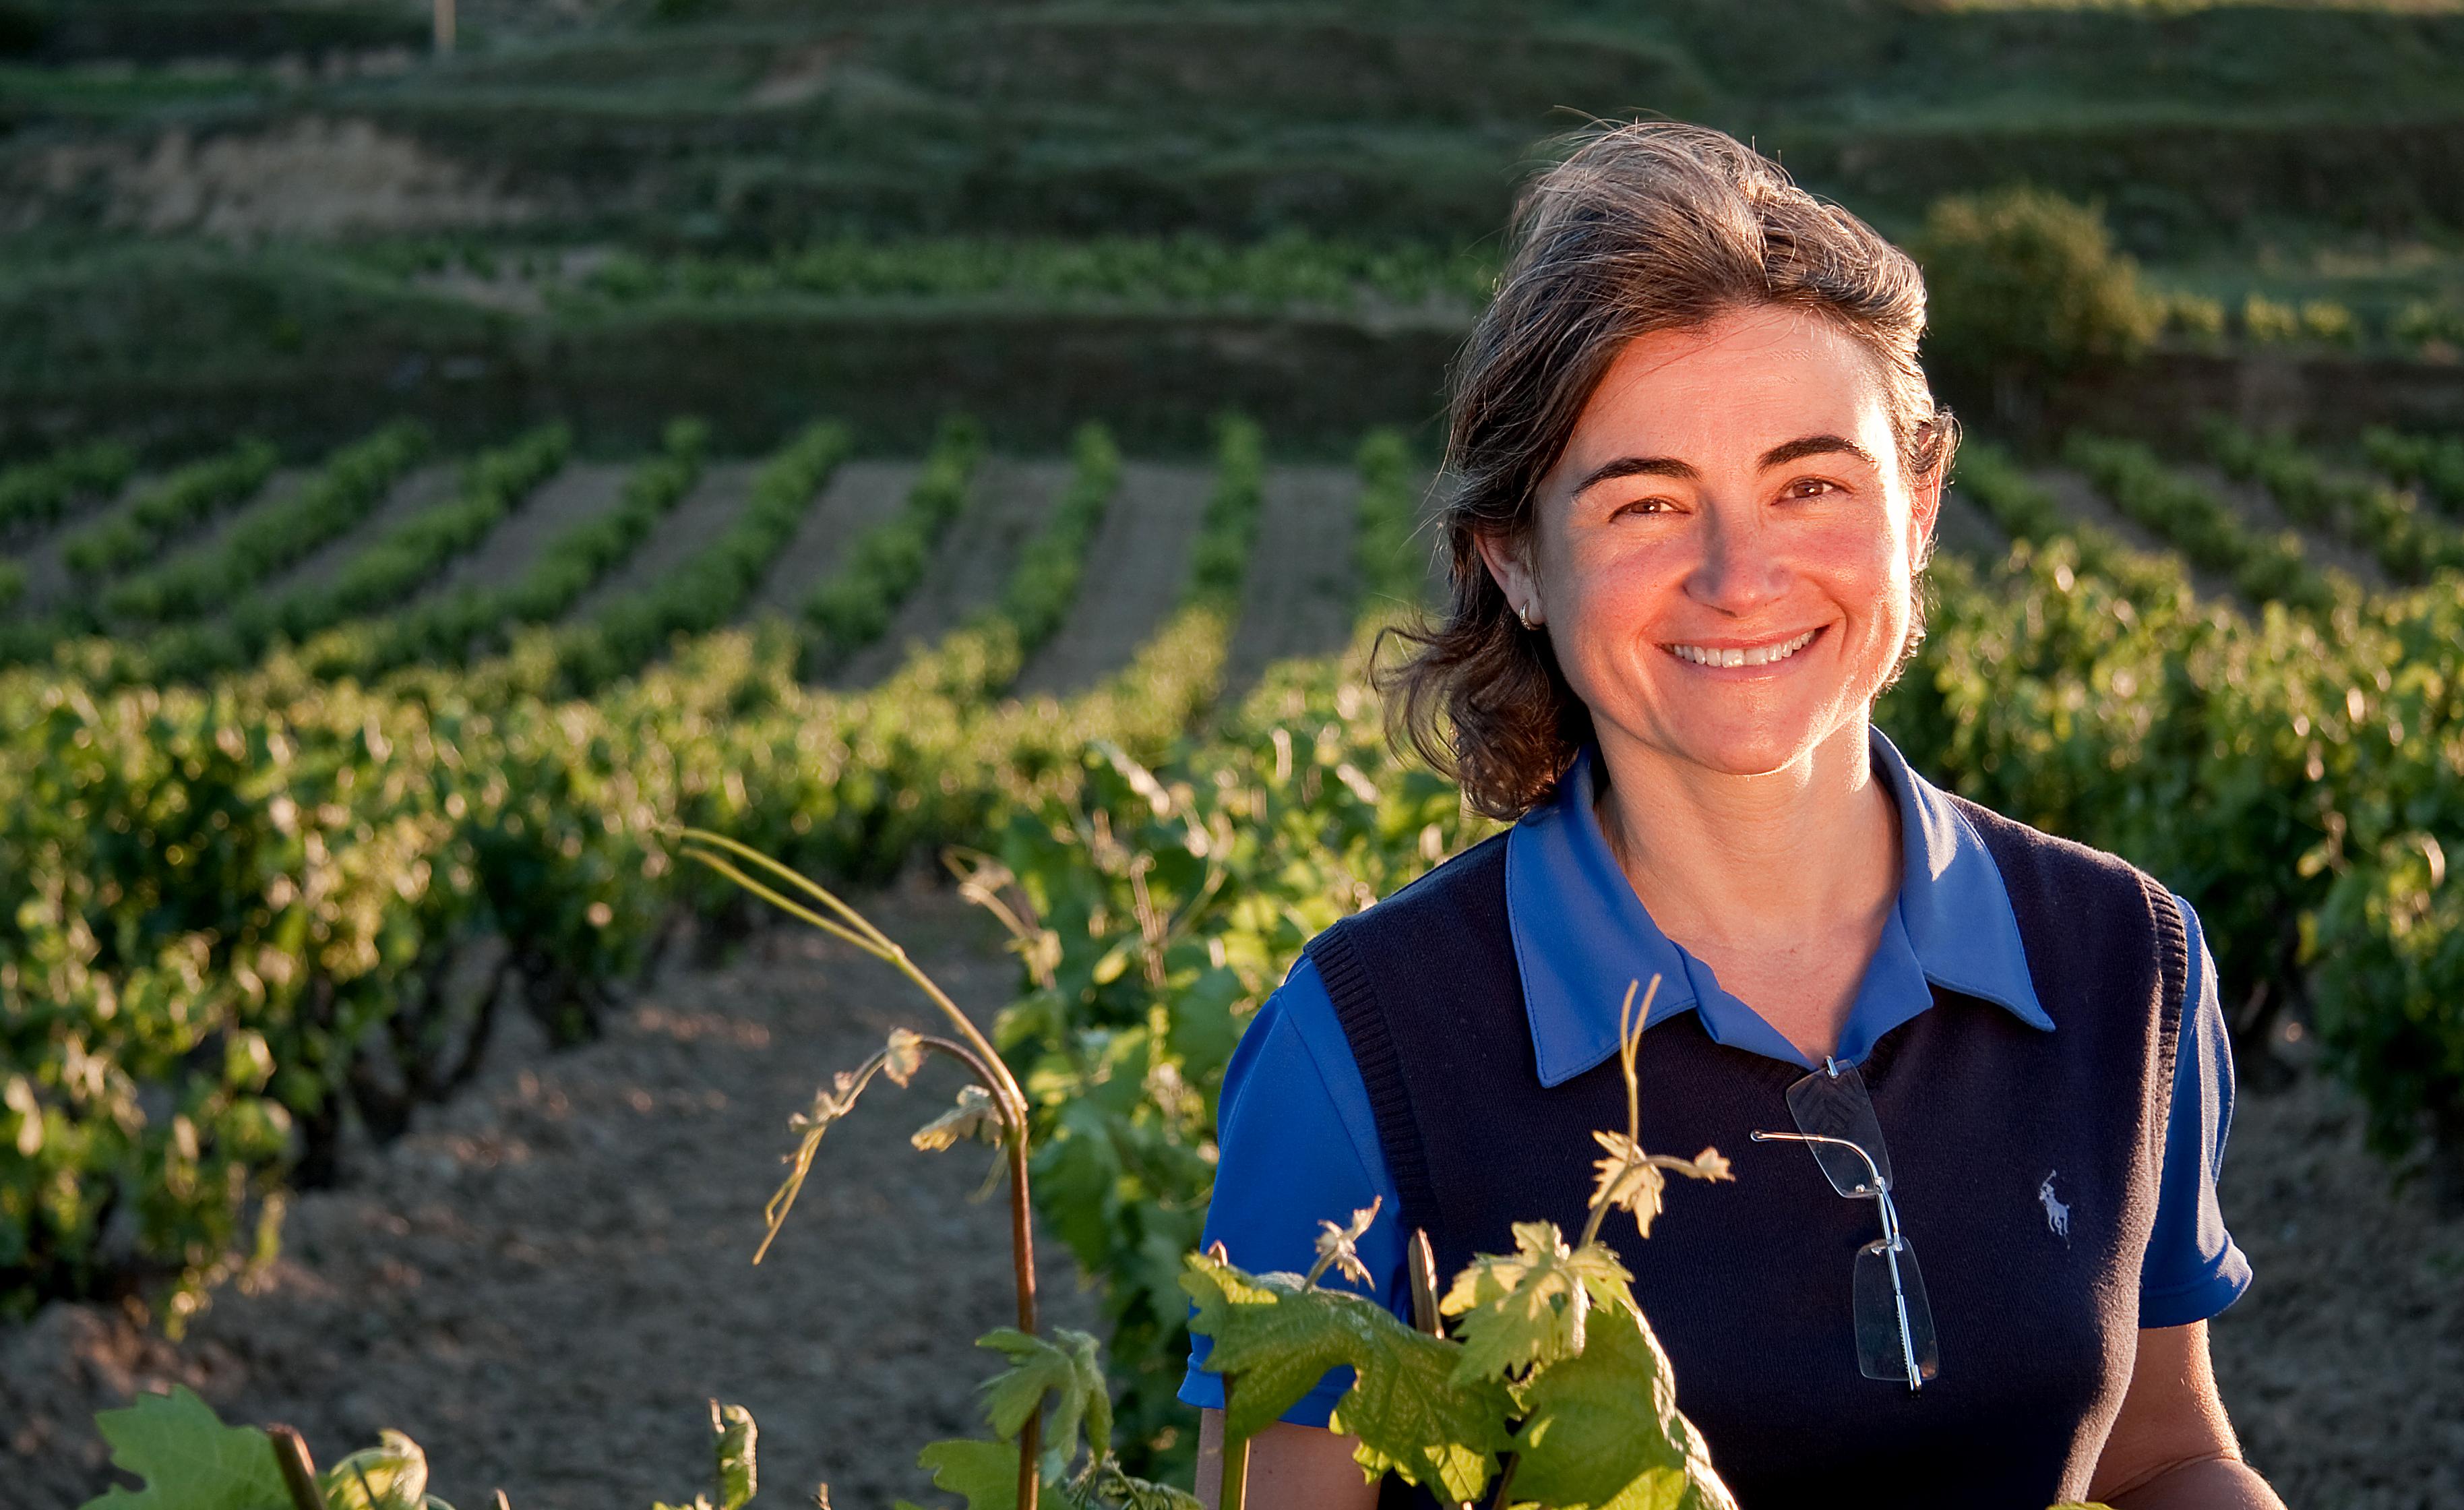 Female Spanish Winemaker